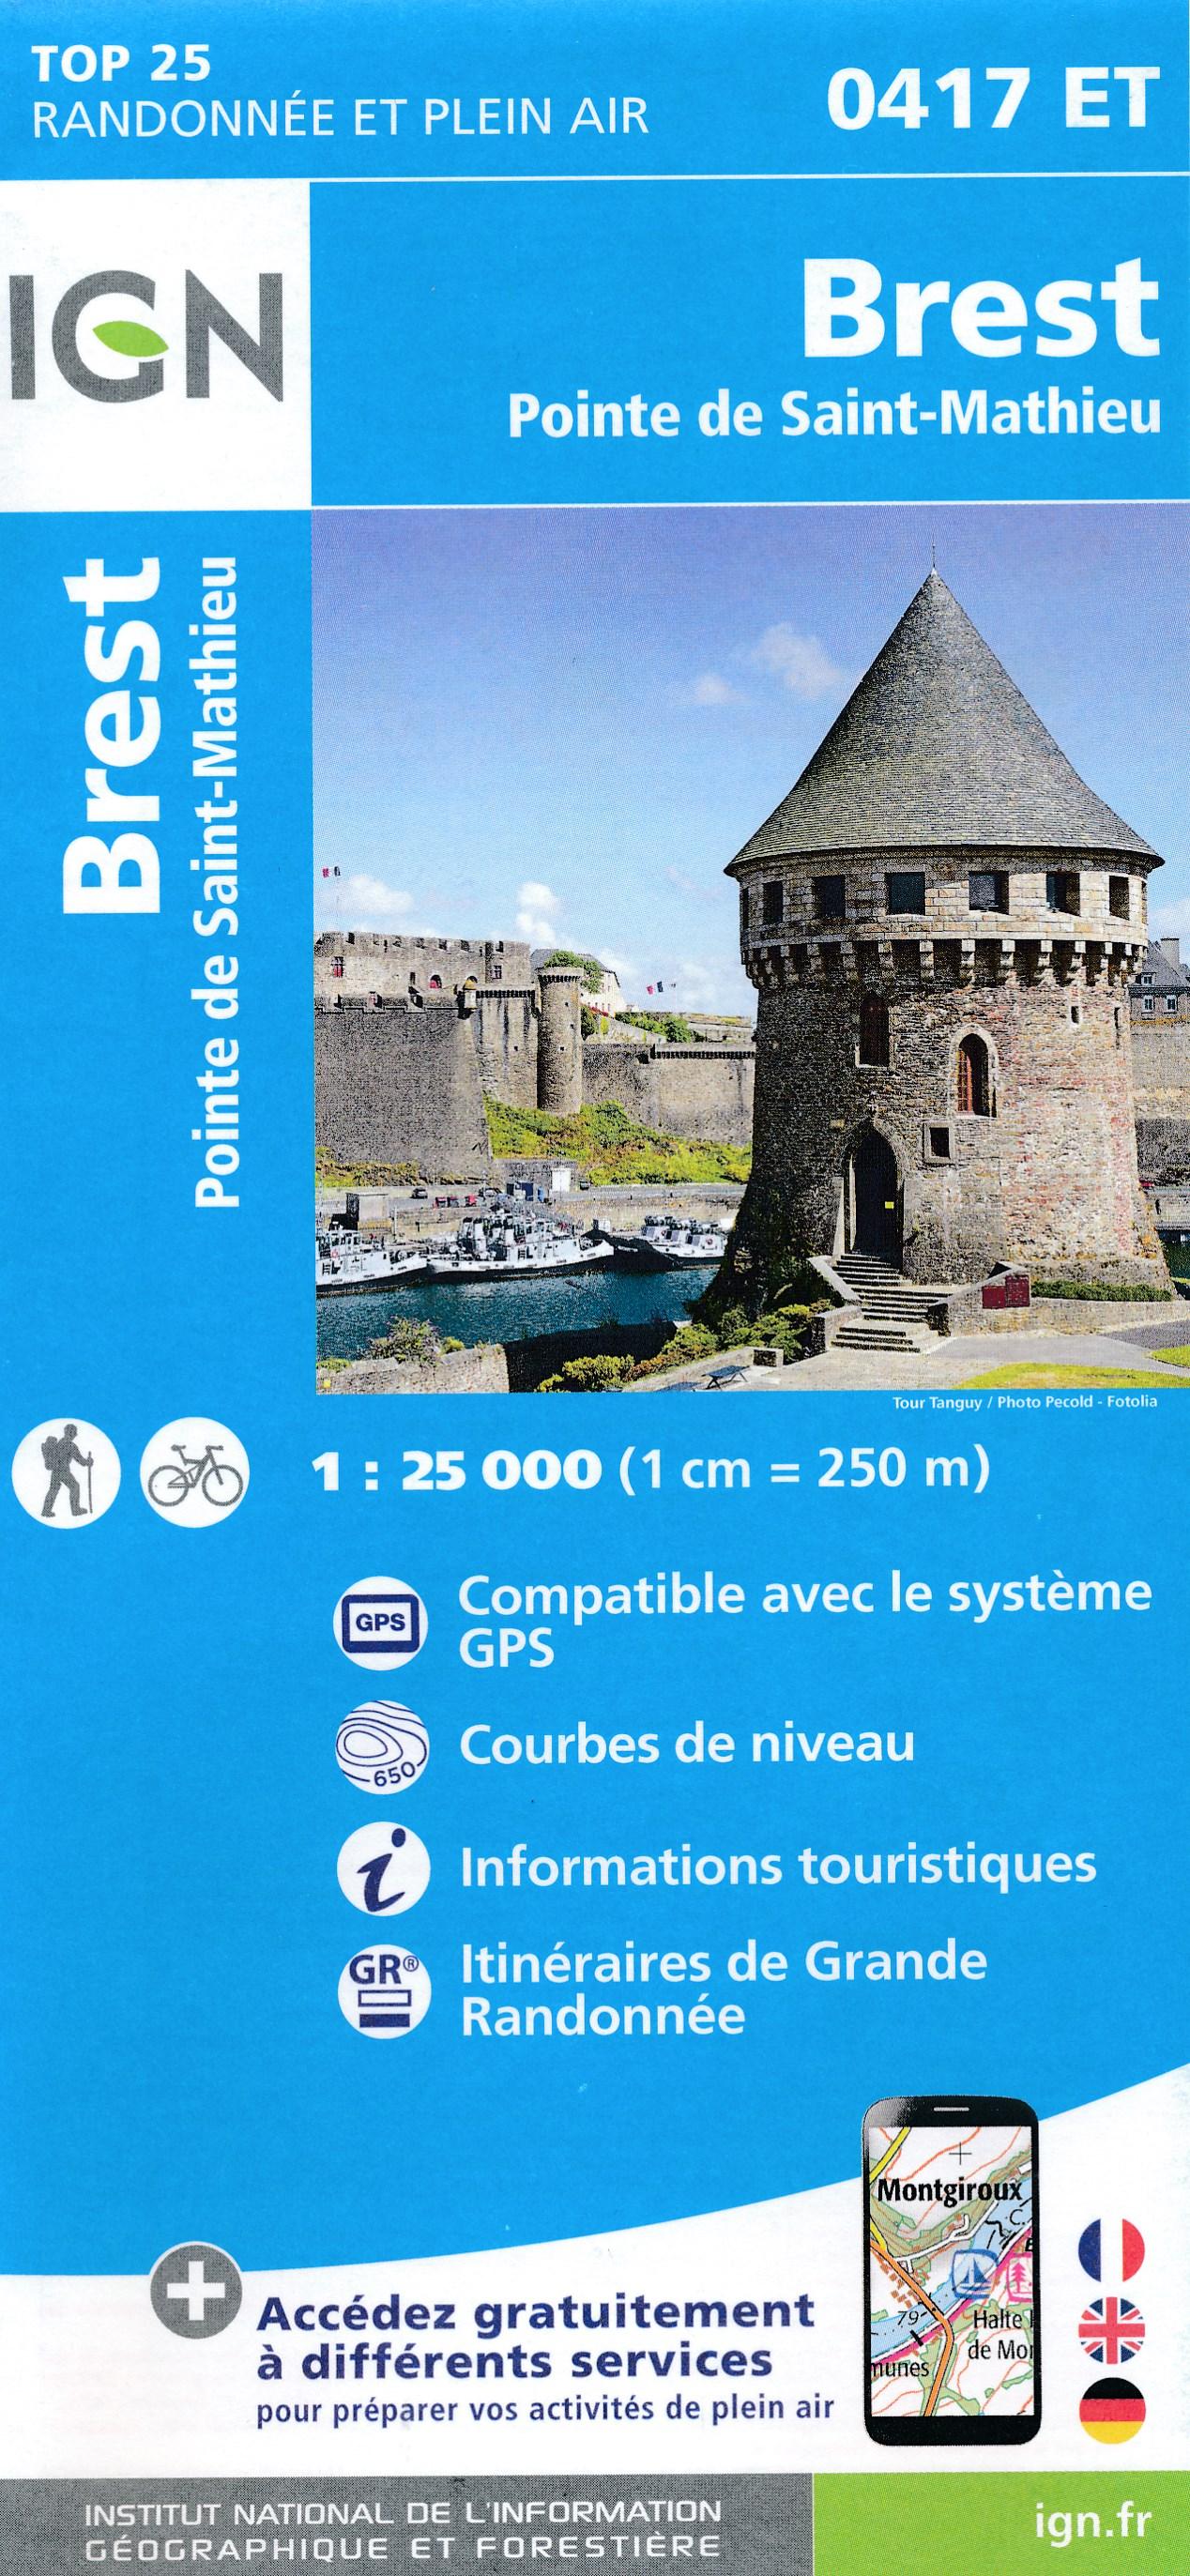 Wandelkaart - Topografische kaart 0417ET Brest, Pointe de St.Mathieu, St.-Renan, Le Conquet, Guipavas | IGN